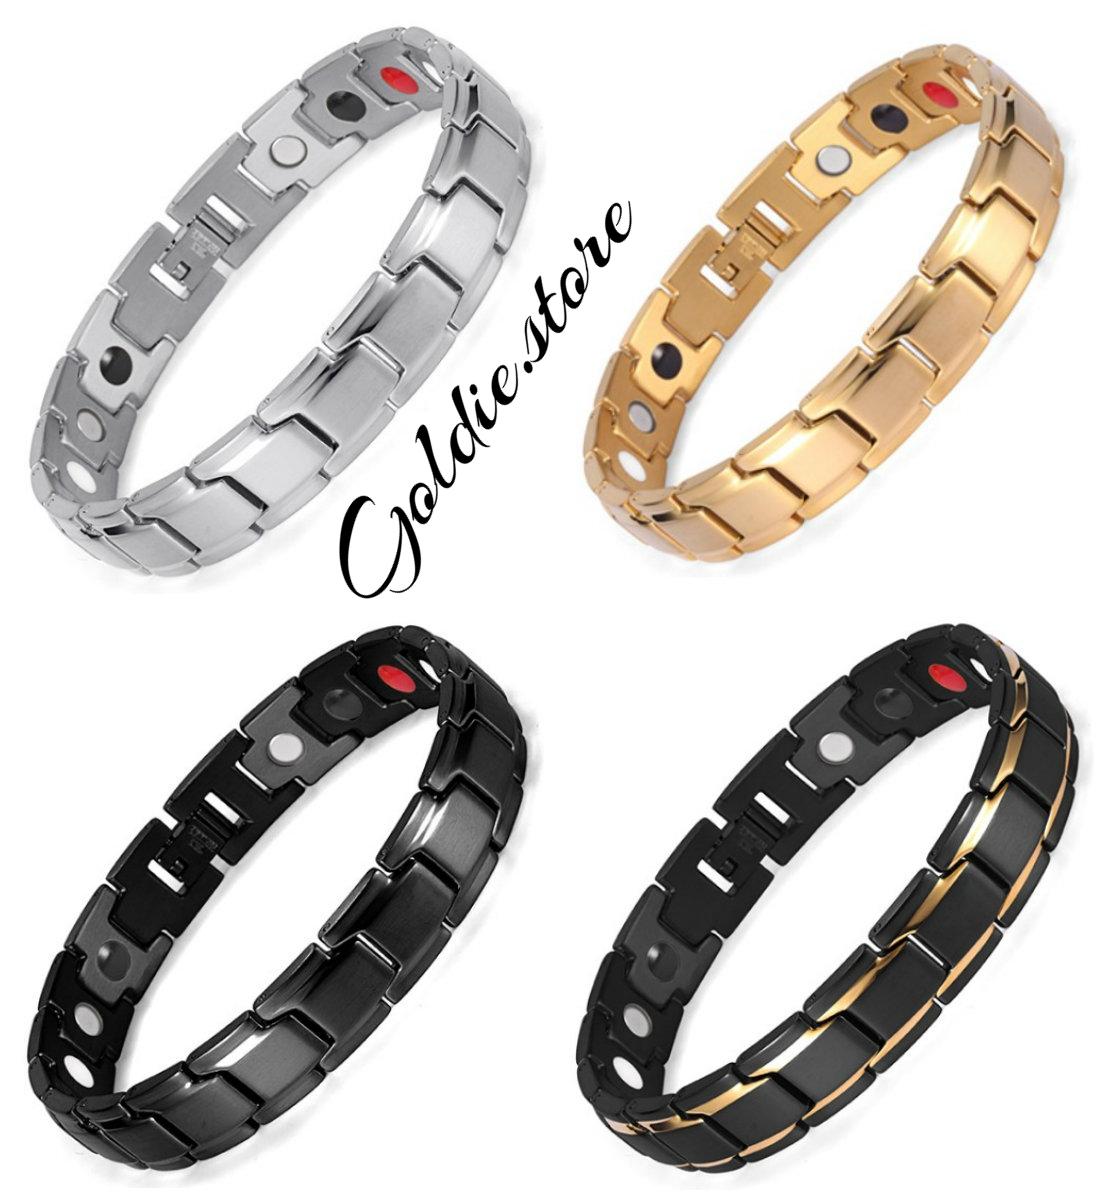 316l Stainless Steel 4 In 1 Bio Magnetic Health Energy Bracelets